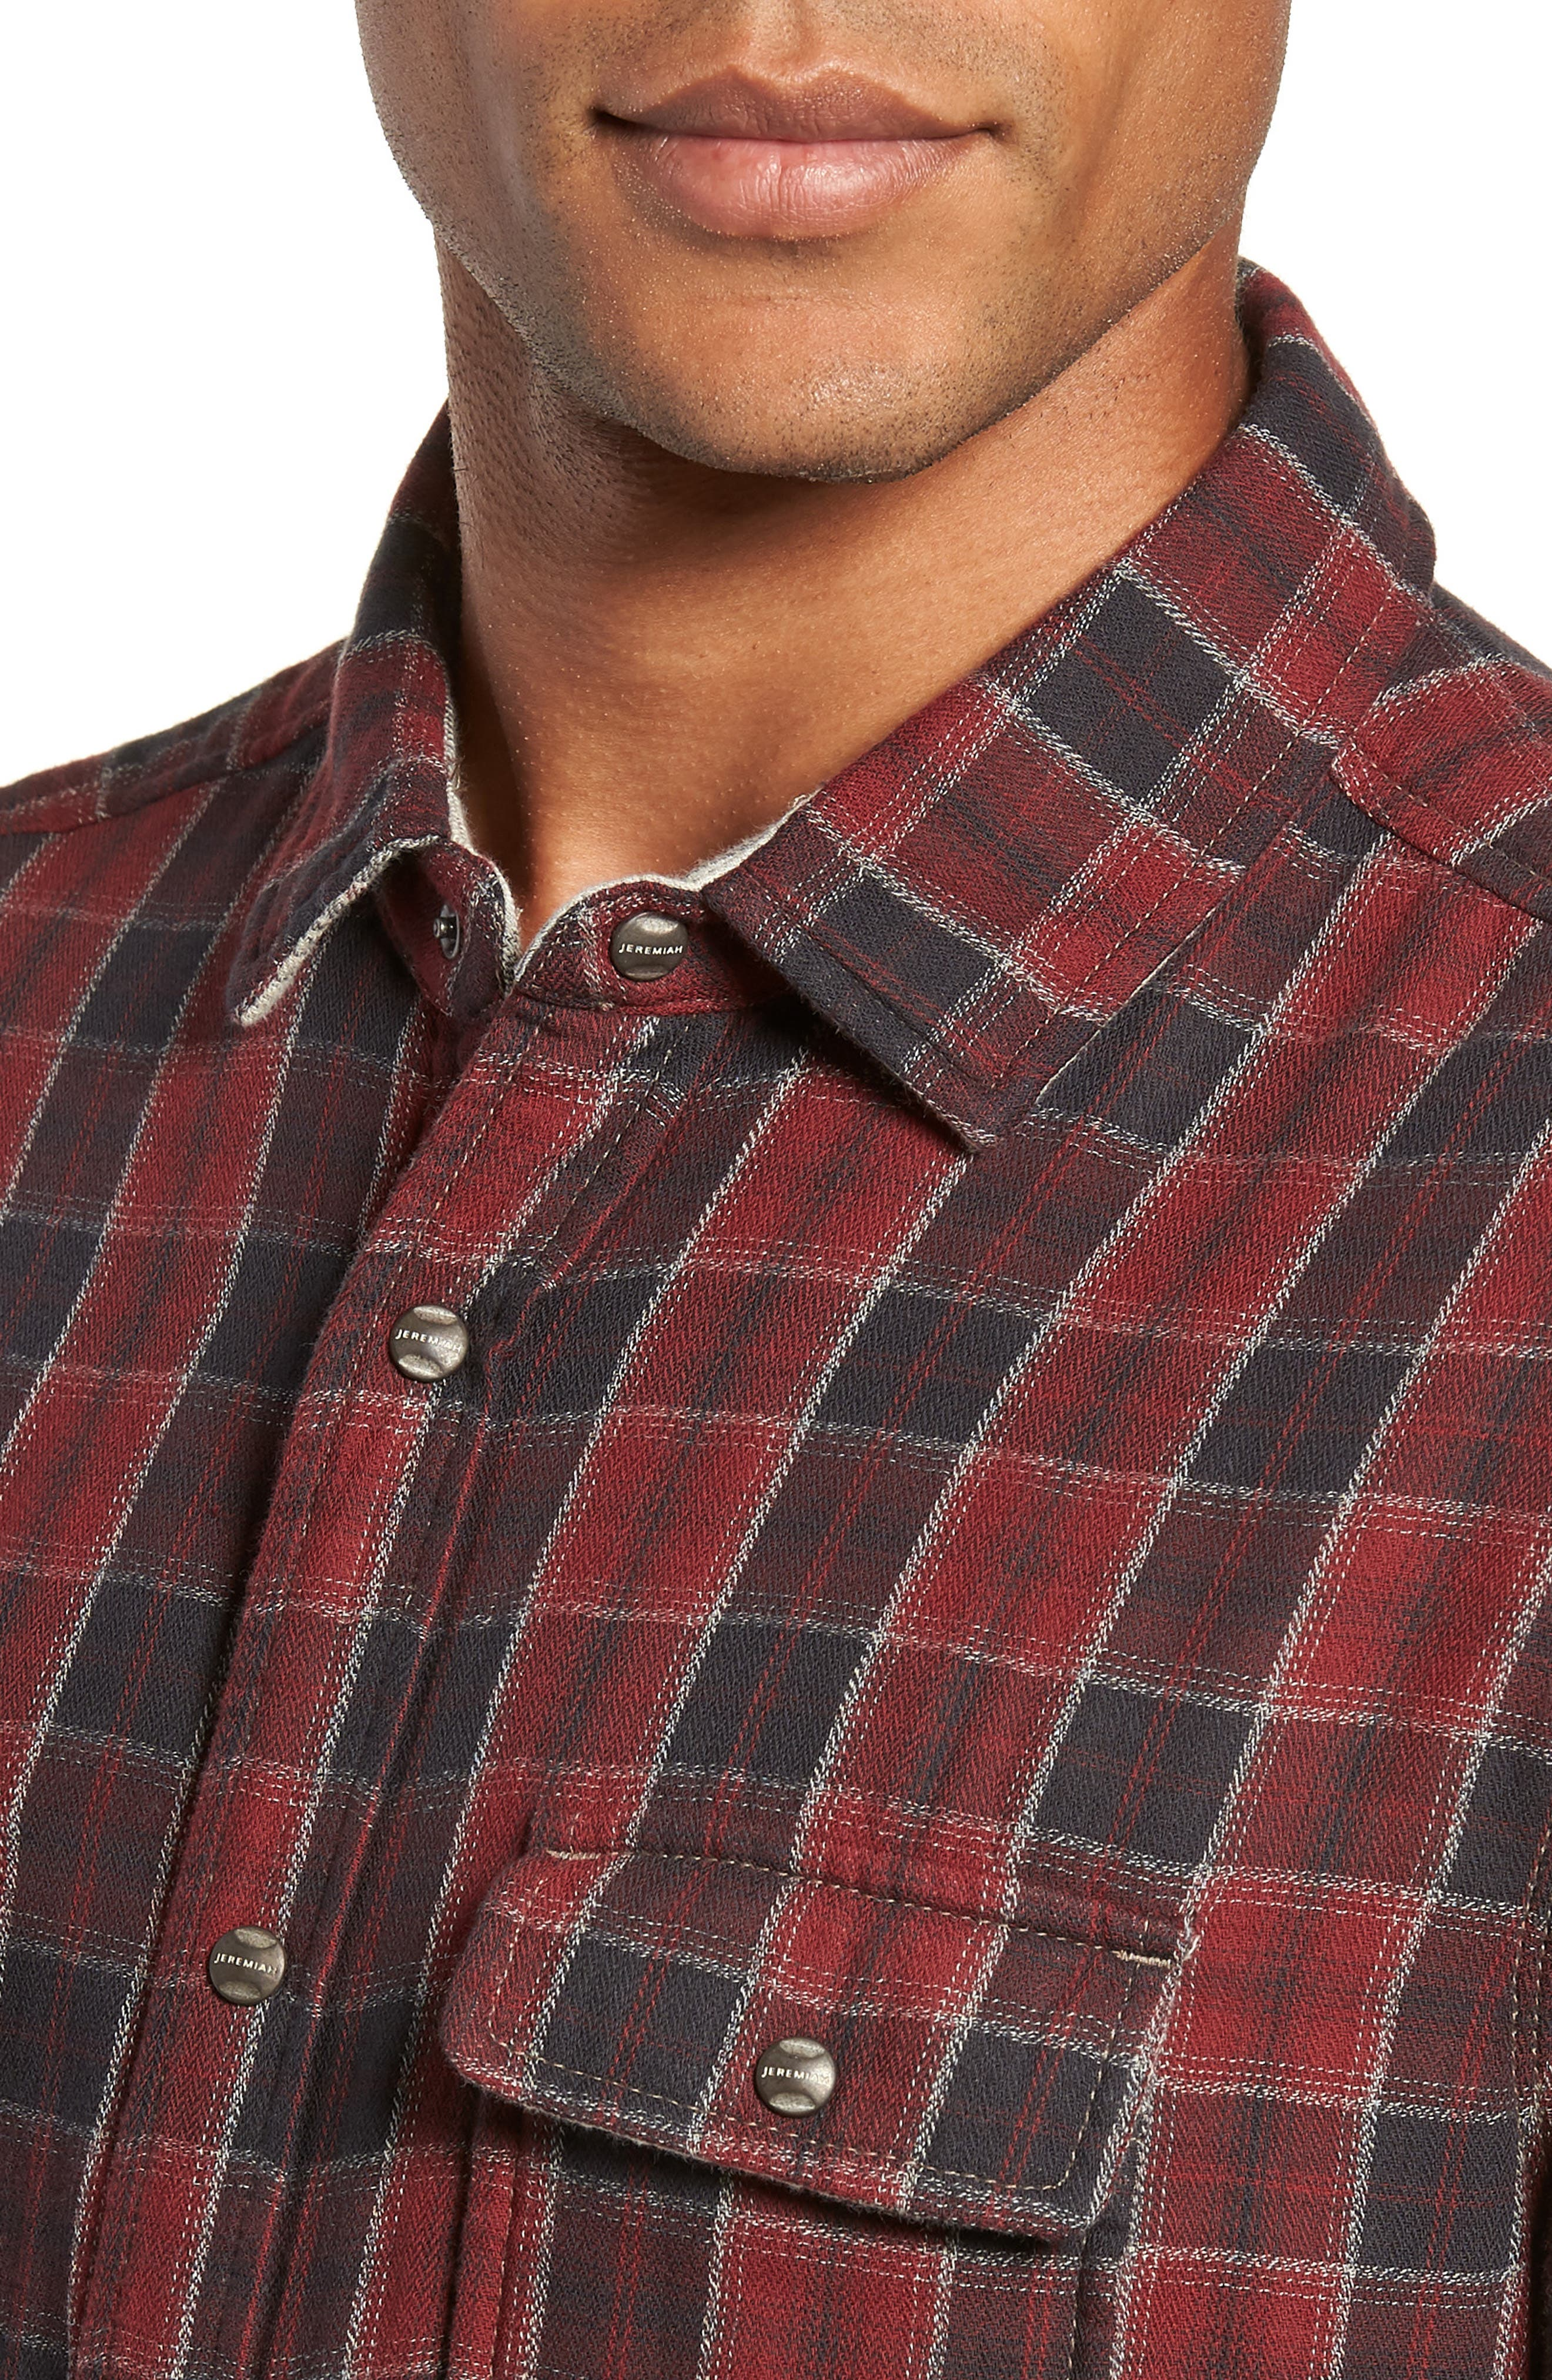 Boulder Regular Fit Reversible Plaid Shirt,                             Alternate thumbnail 3, color,                             OXBLOOD